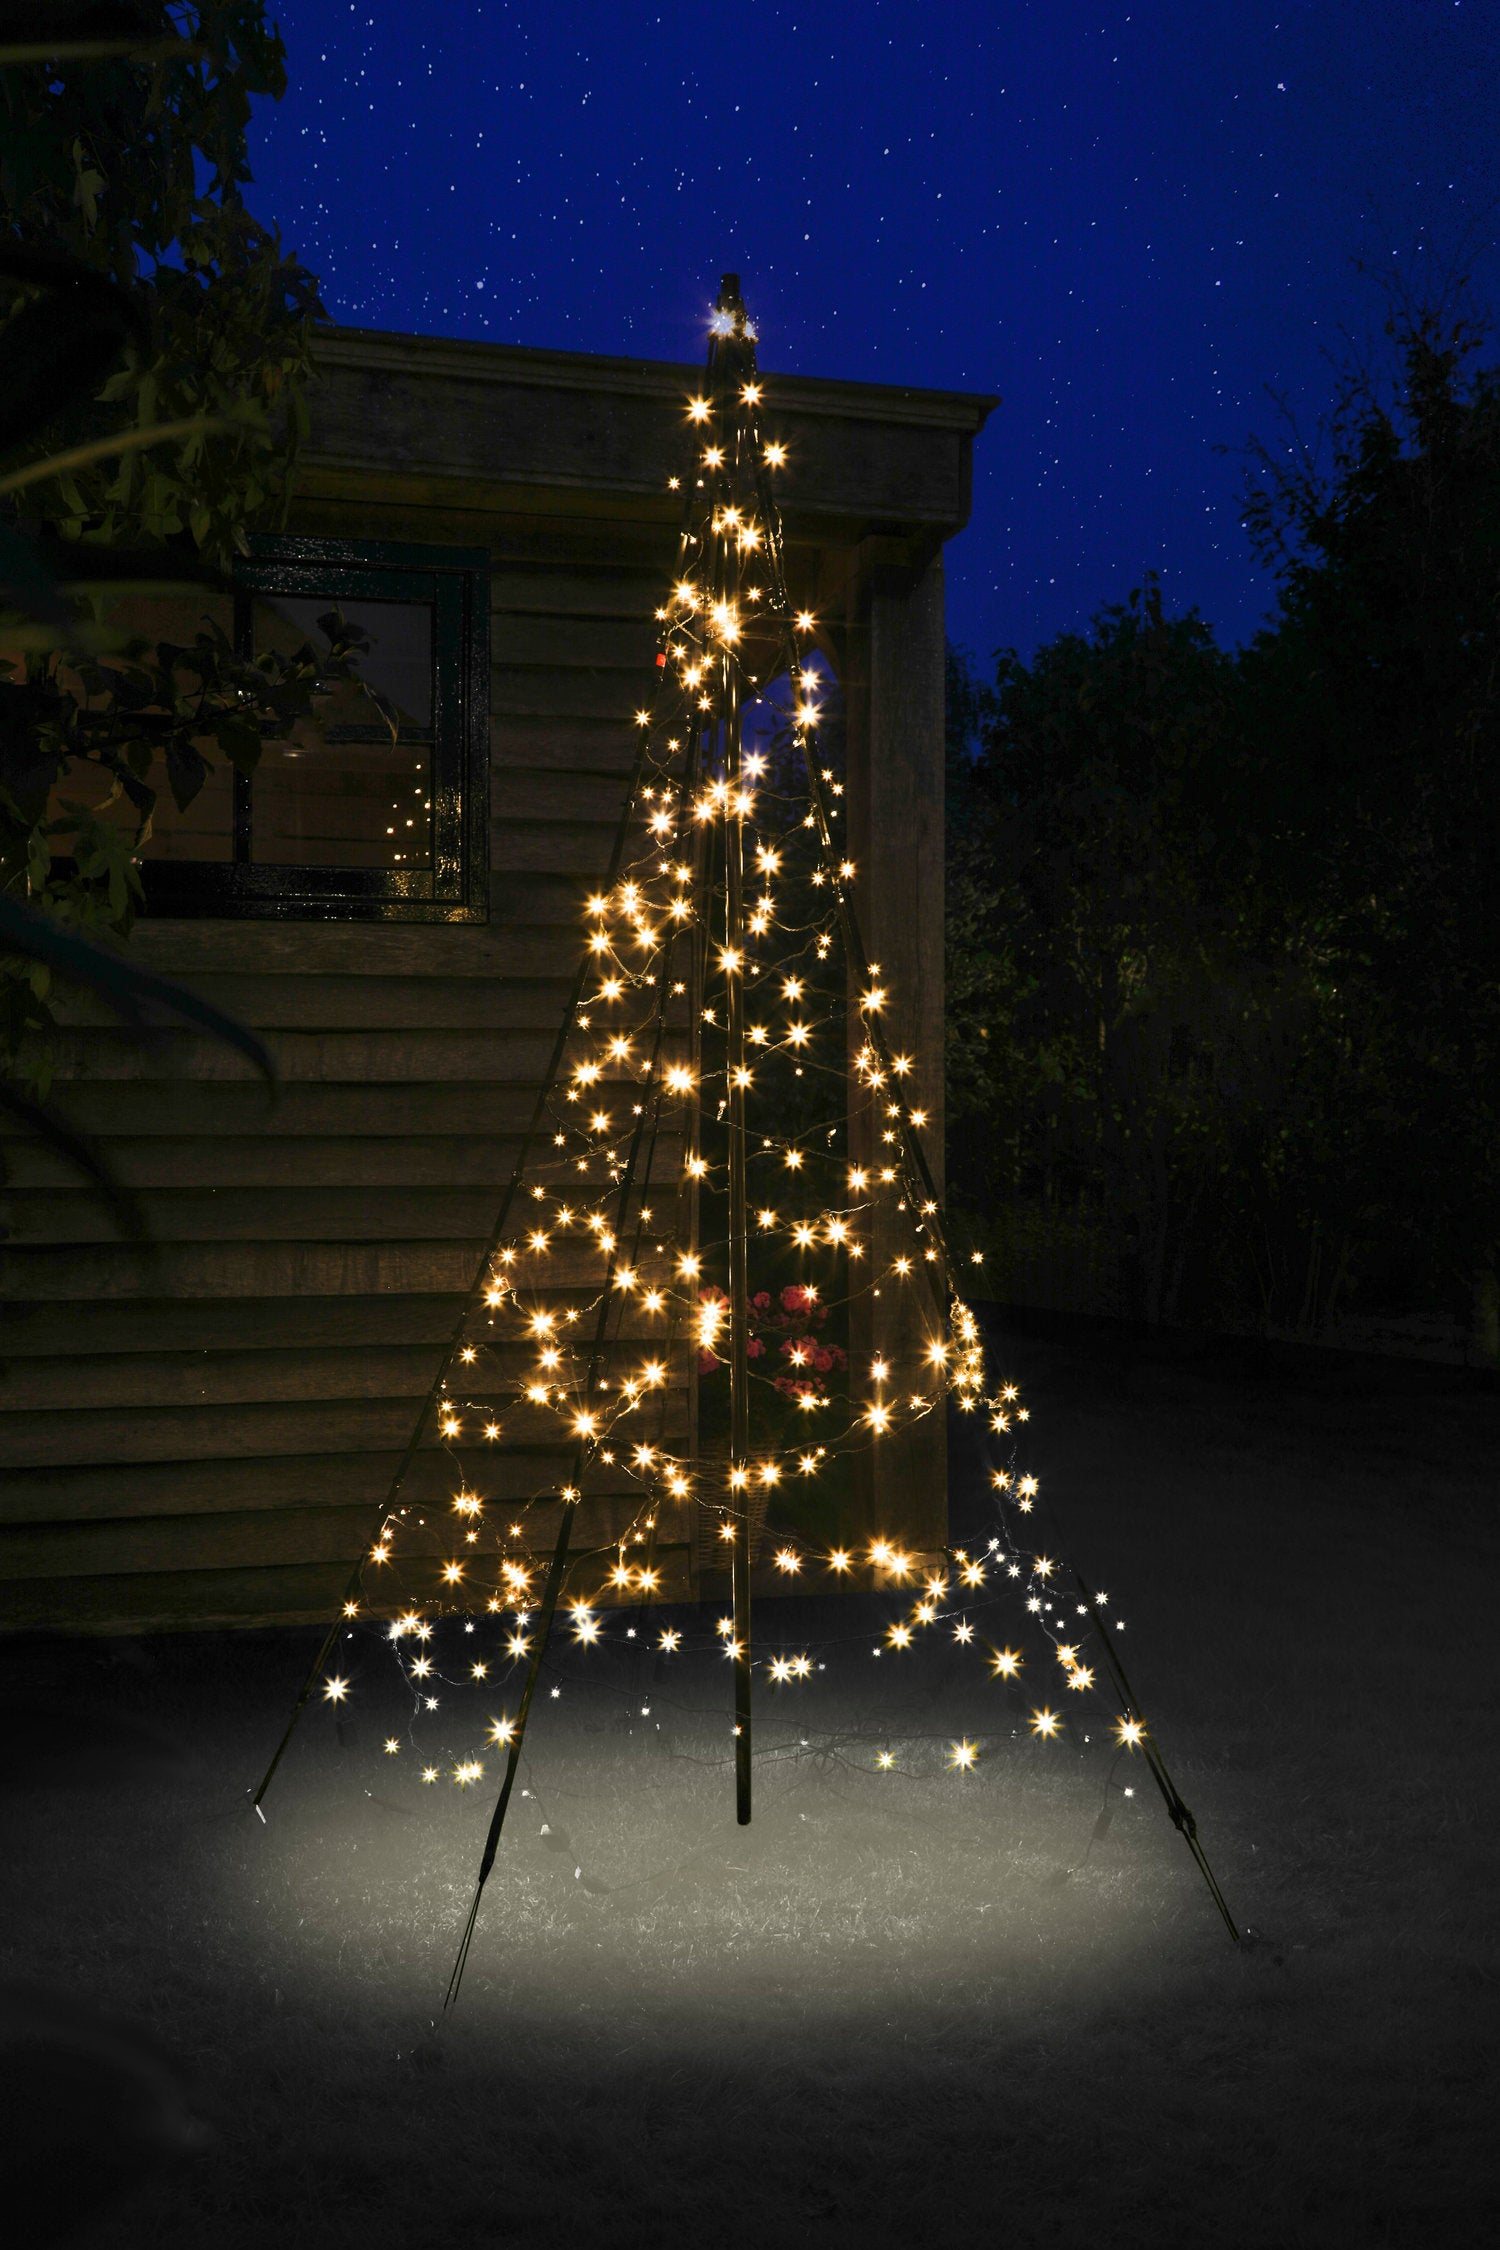 Fairybell vlaggenmast kerstboom H 200 cm met 300 LED lampjes warm wit